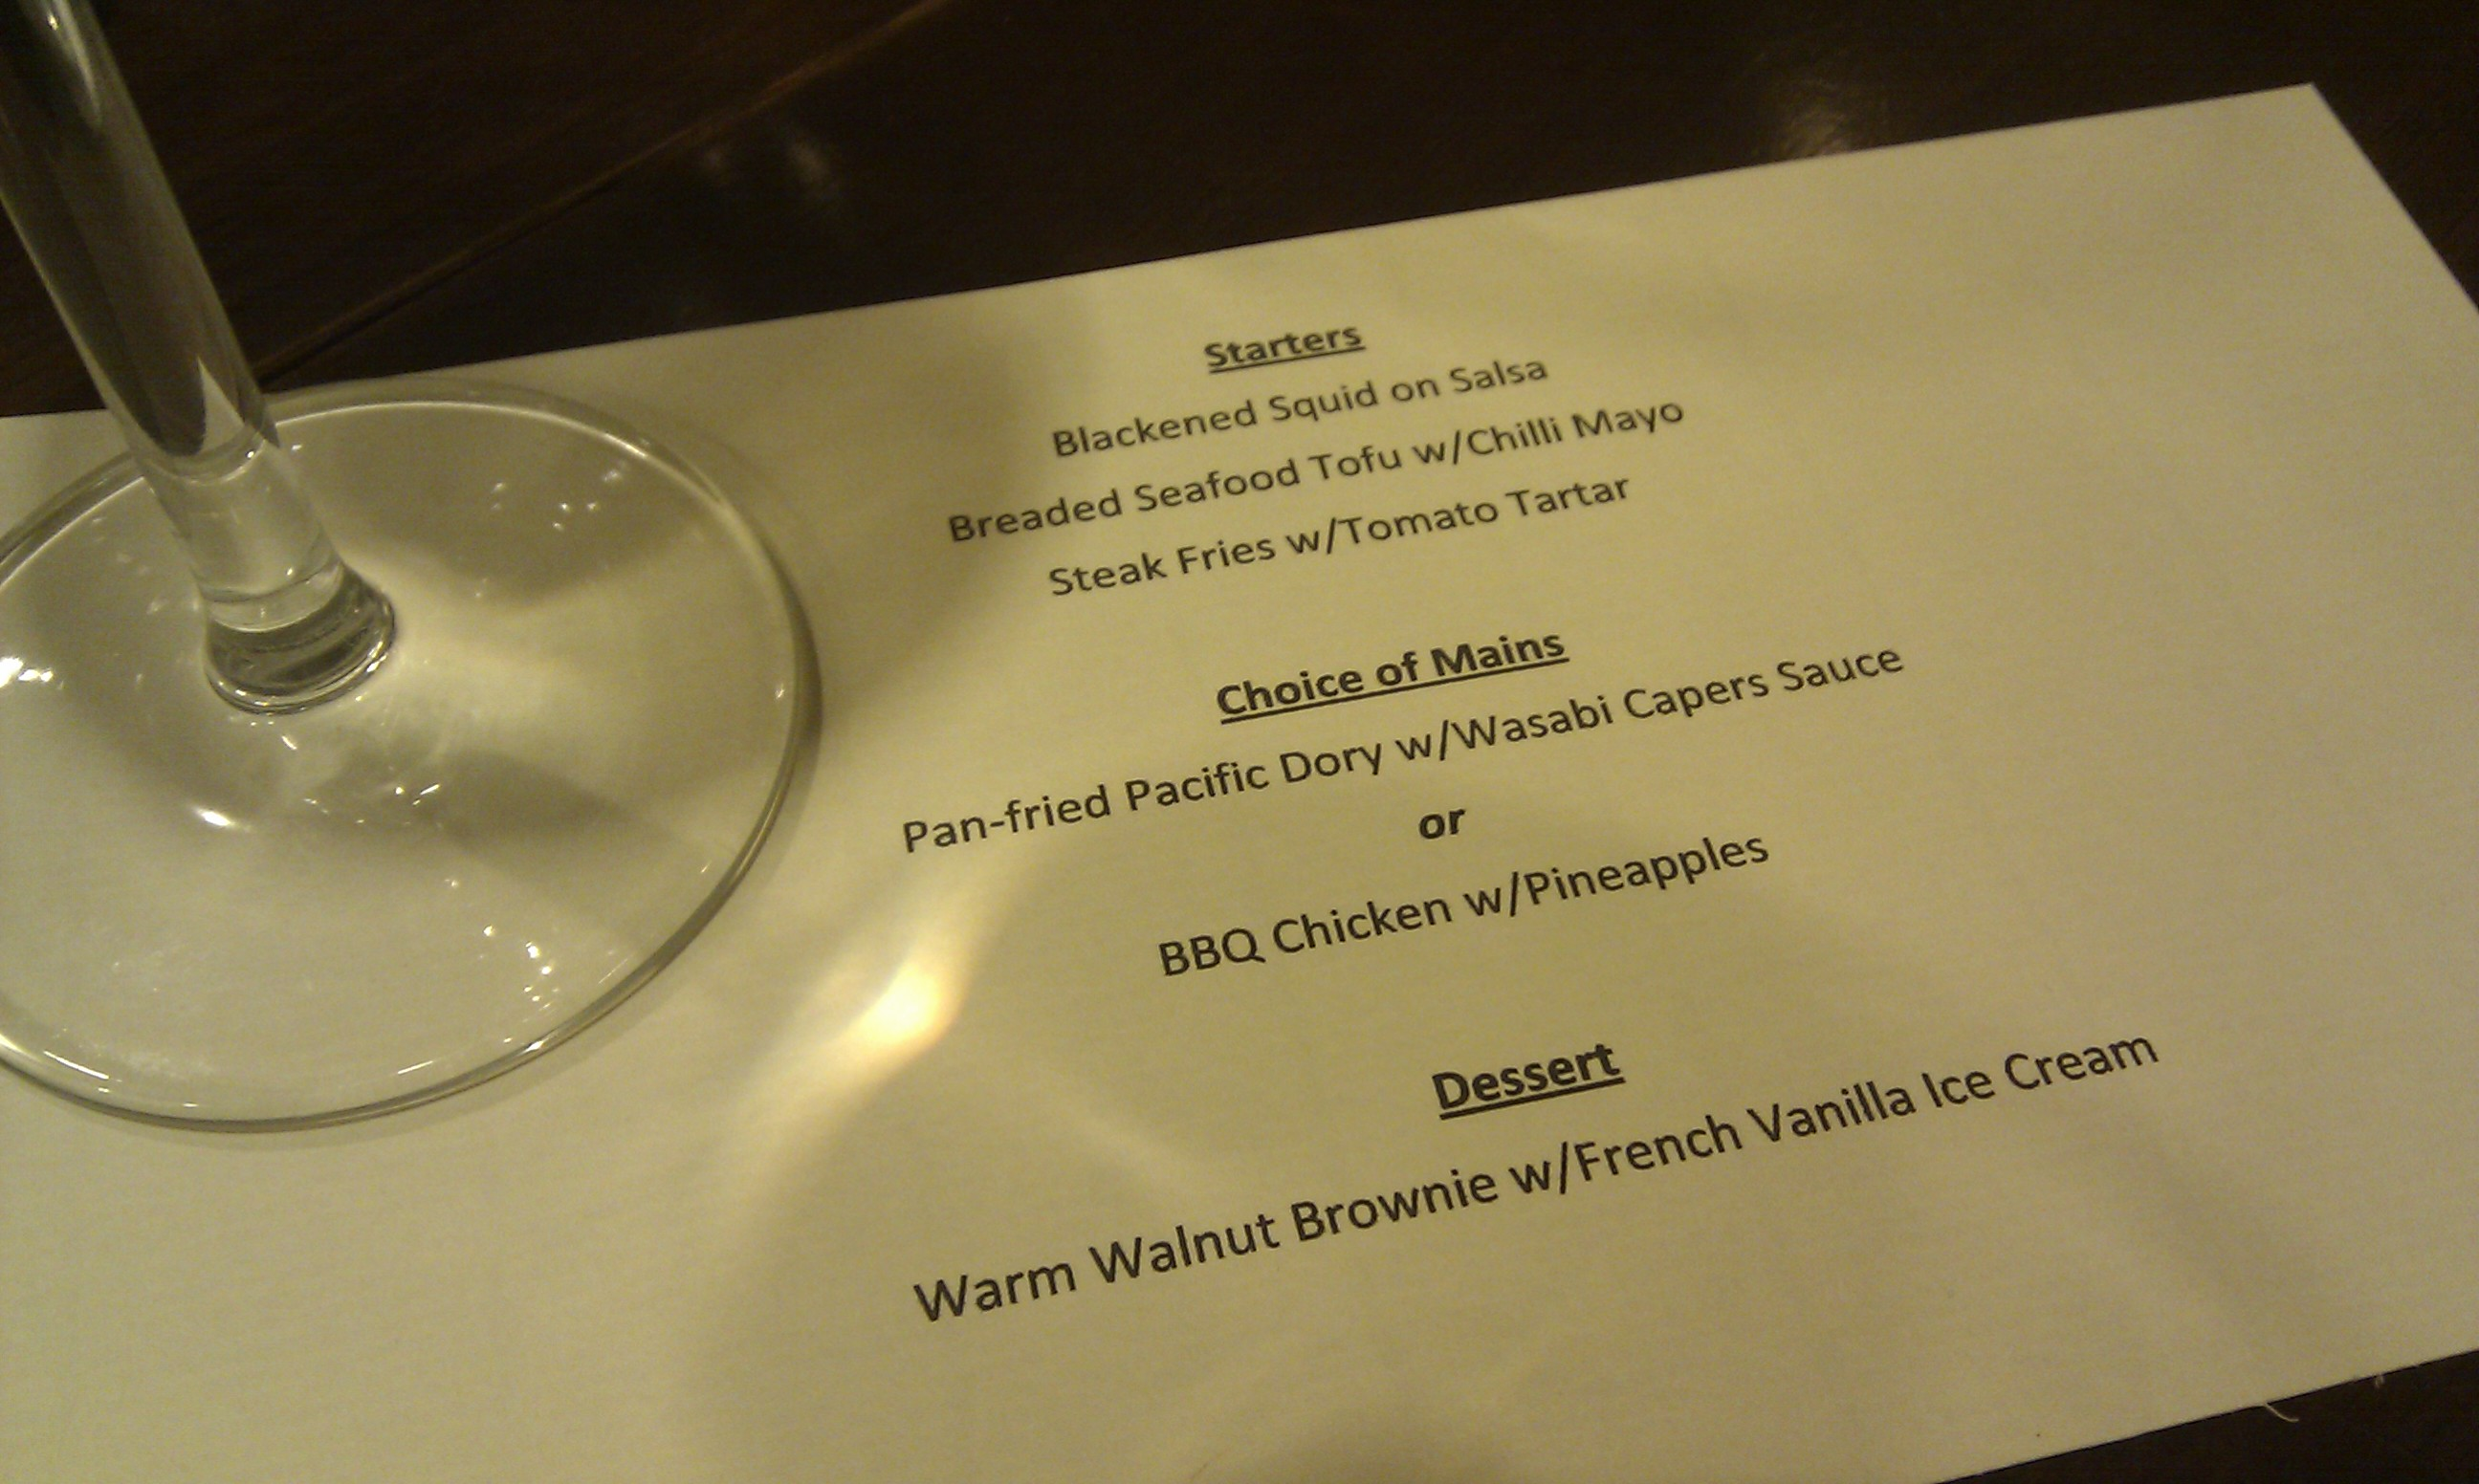 Classics wine dinner - menu